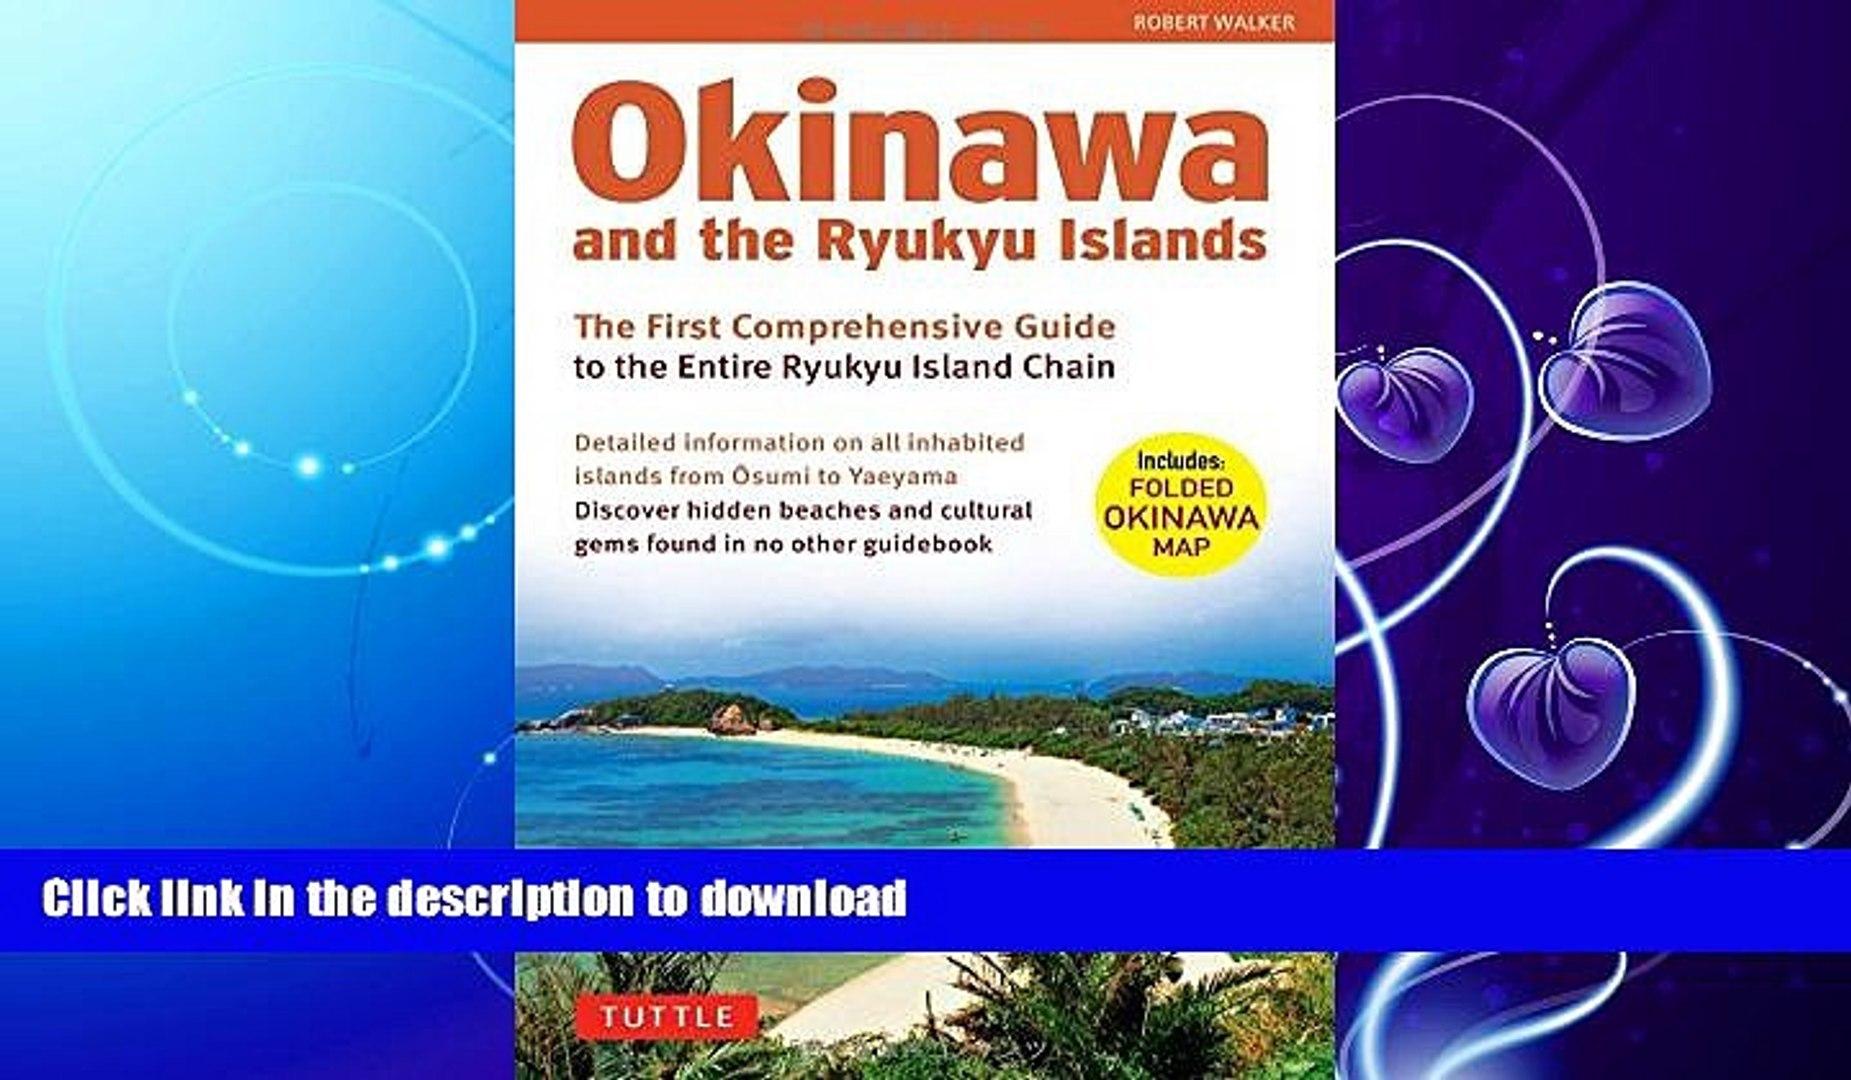 Favorite Book Okinawa And The Ryukyu Islands The First Comprehensive Guide To The Entire Ryukyu